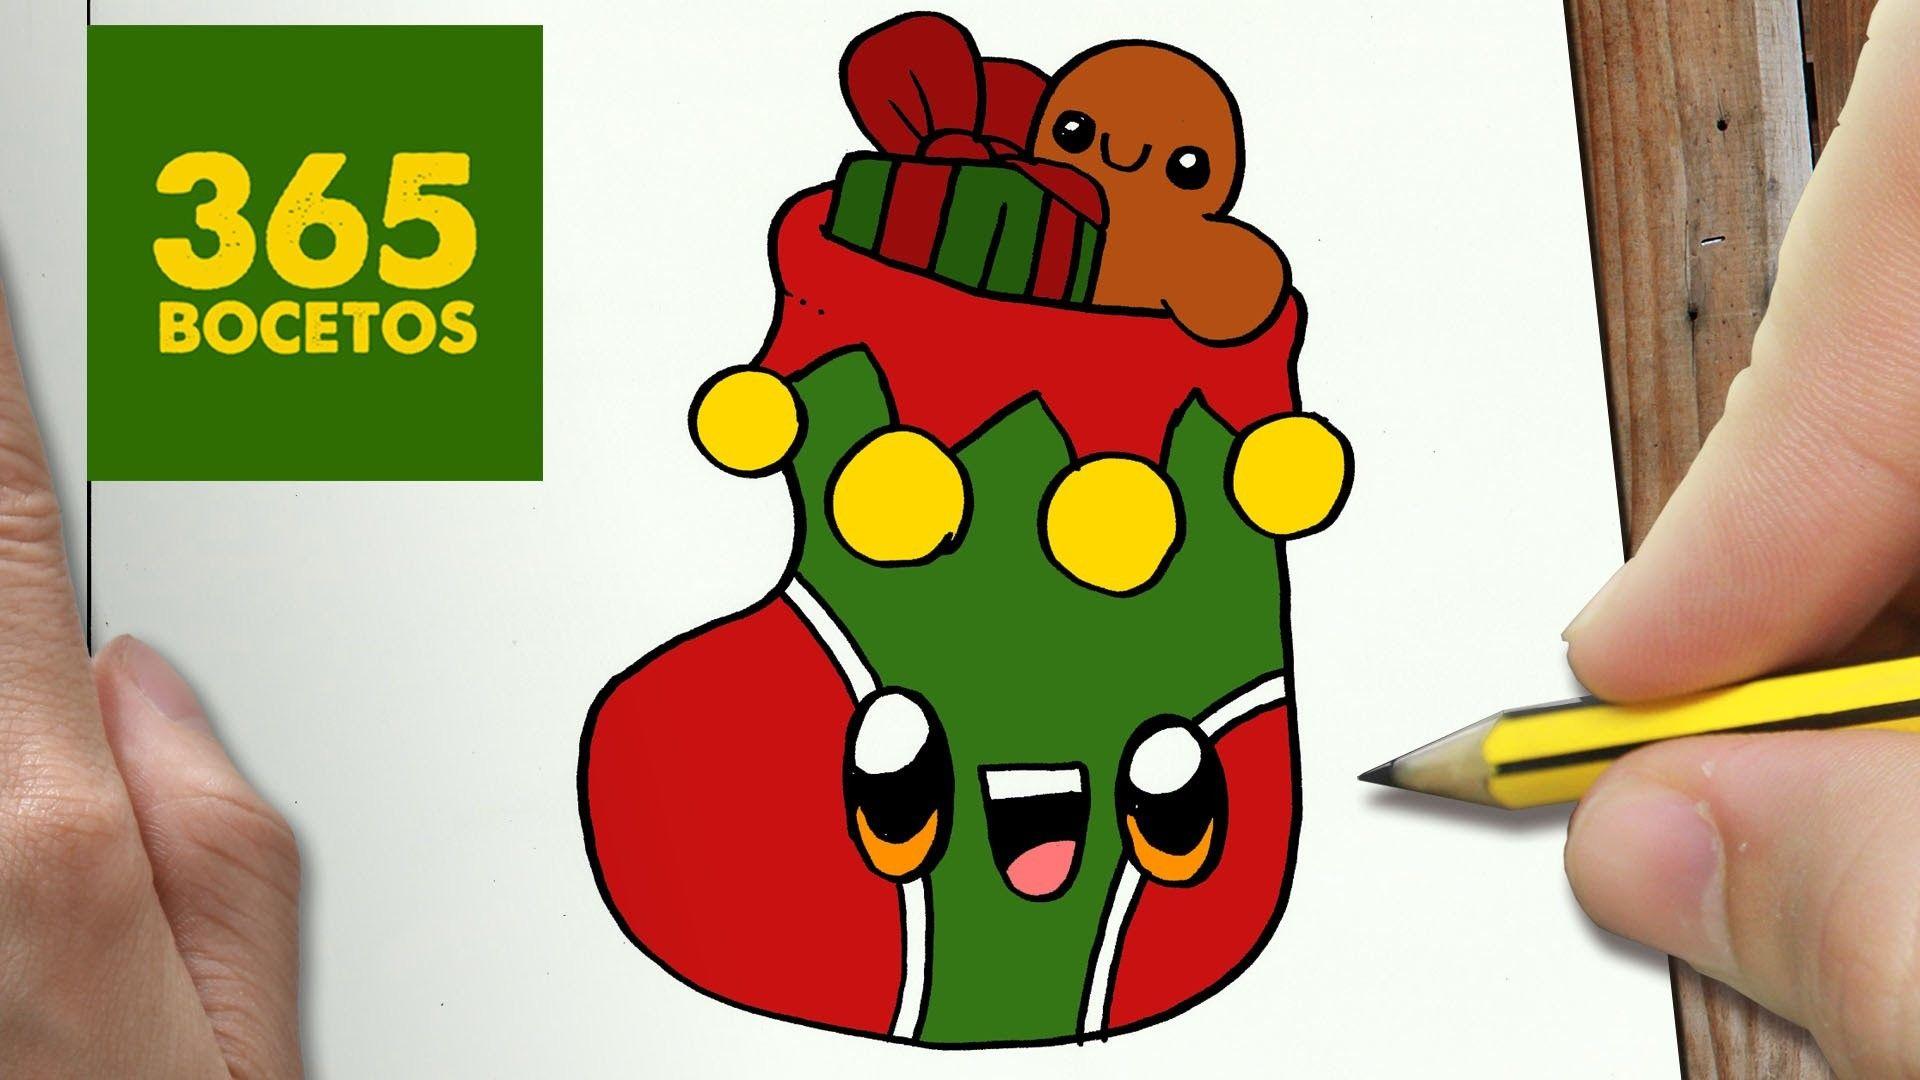 Miifotos Navidad Kawaii 365 Bocetos Christmas Wwwmiifotoscom